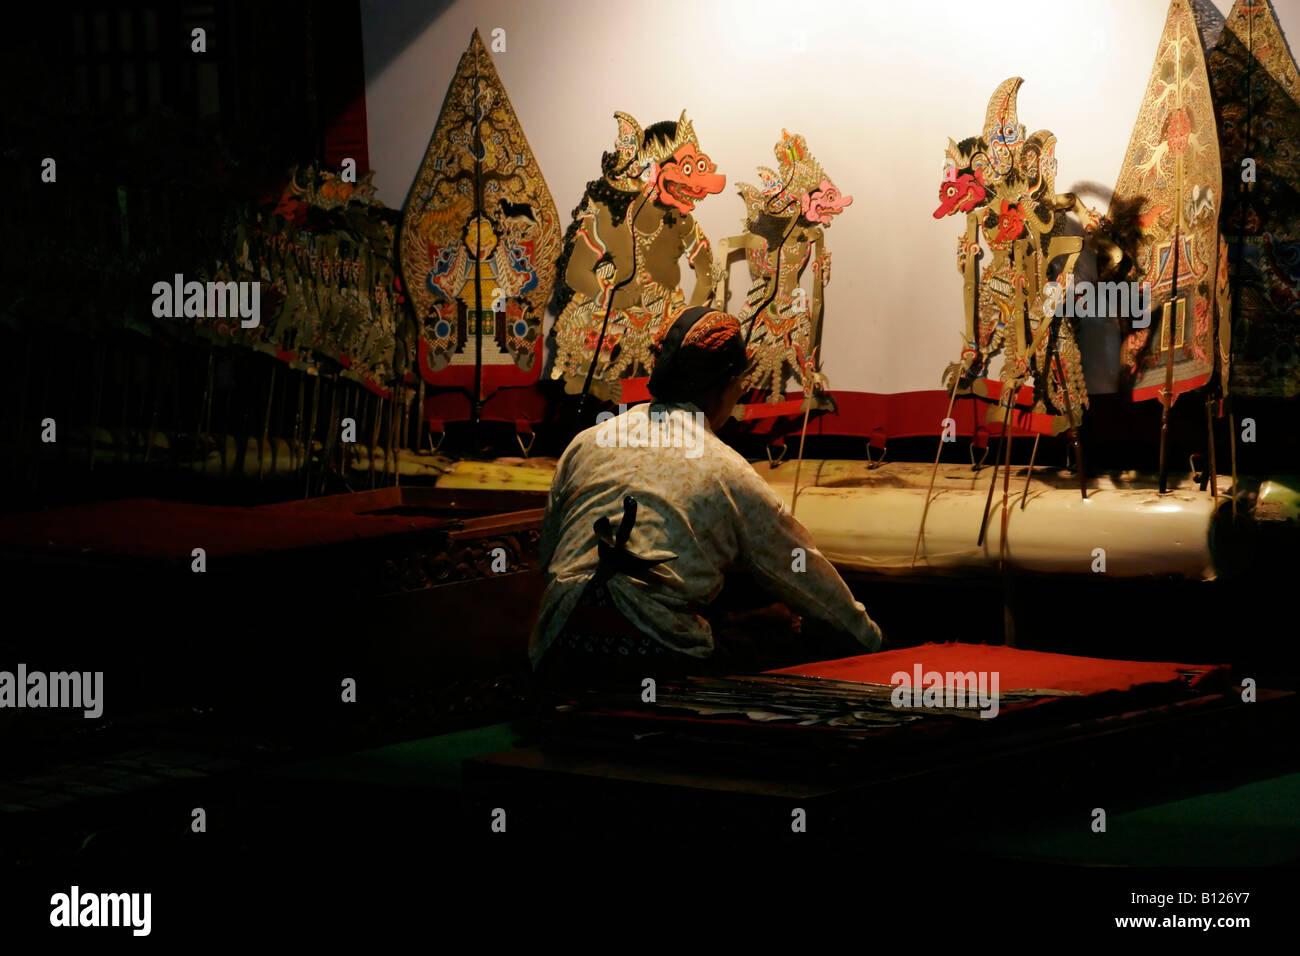 Wayang kulit teatro de marionetas de sombras yogyakarta - Artesania de indonesia ...